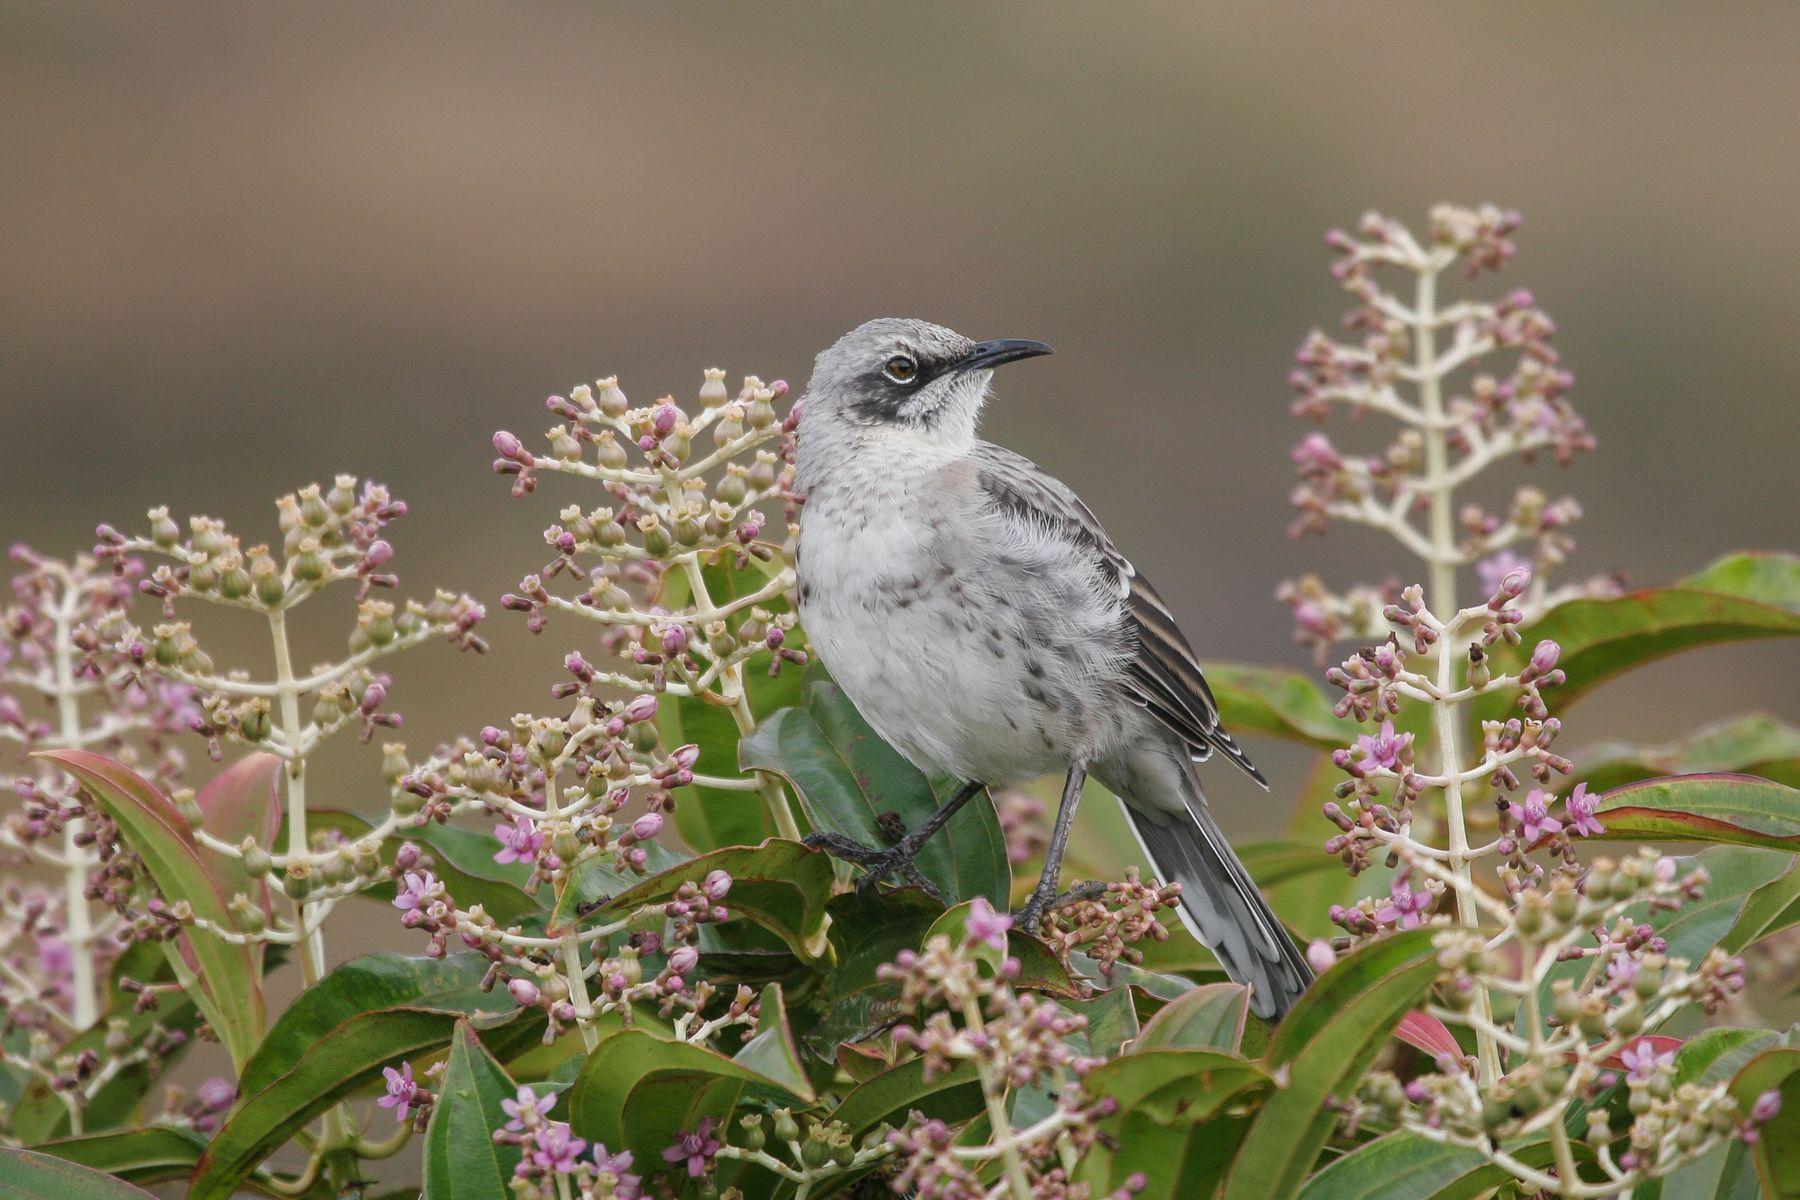 The uncommon San Cristobal Mockingbird